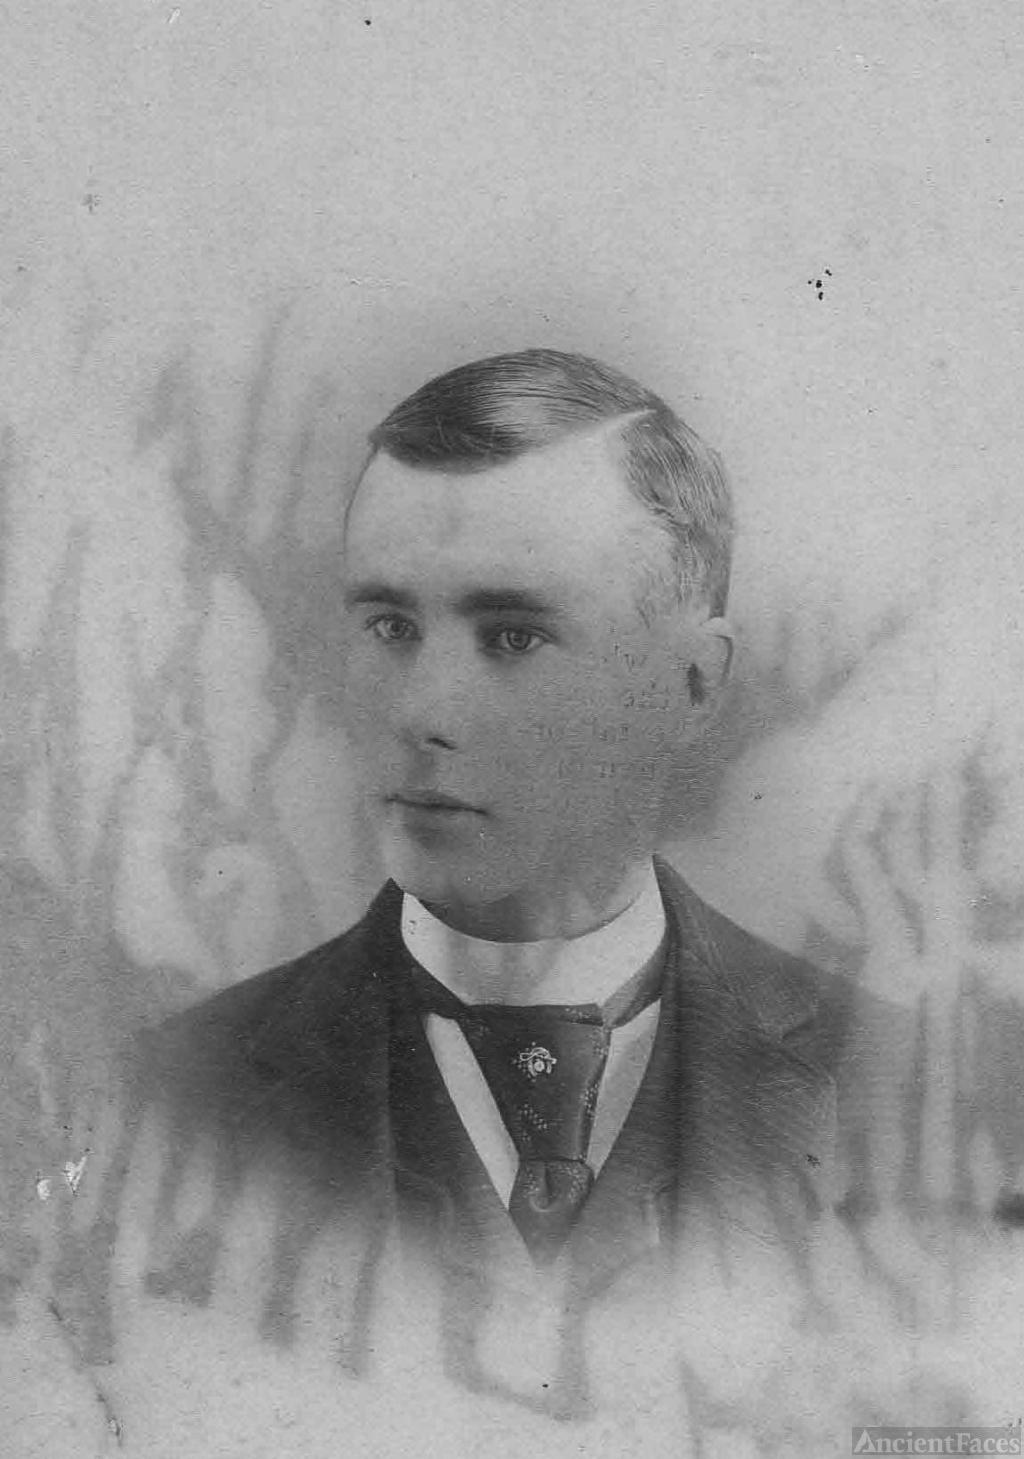 Joseph Baumgart, 1869-1942